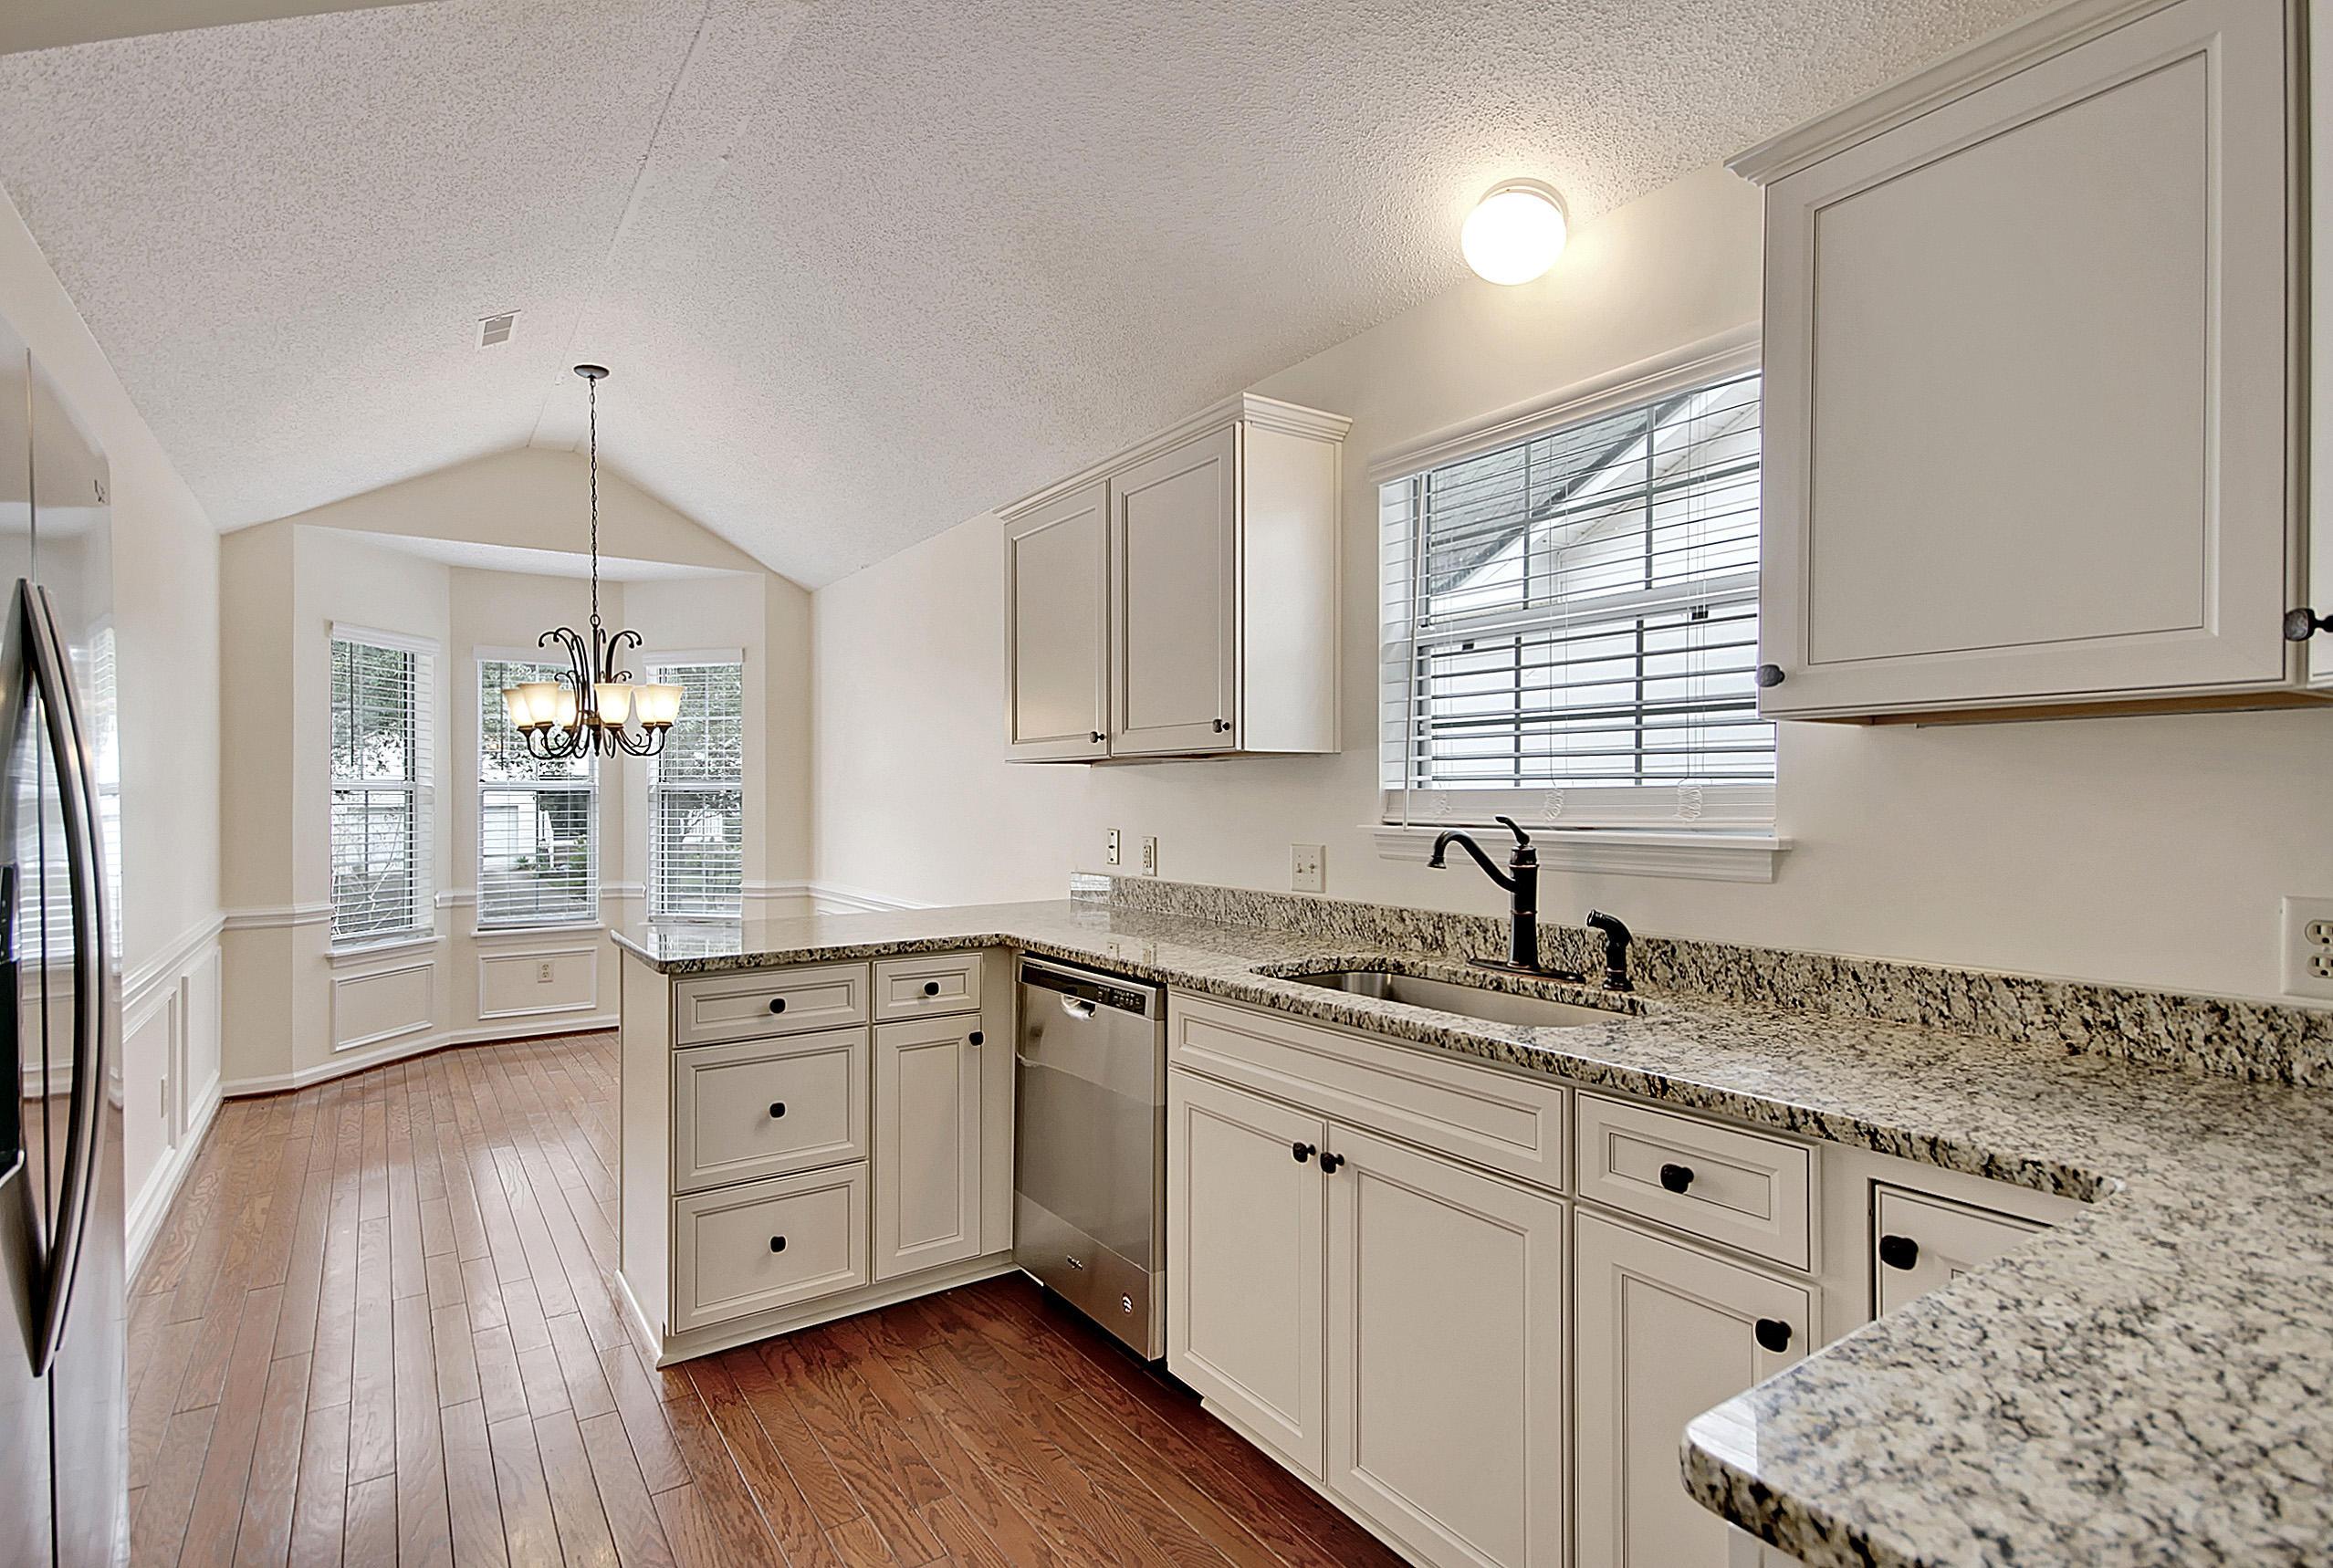 Harbor Place Homes For Sale - 845 Harbor Pl, Charleston, SC - 9